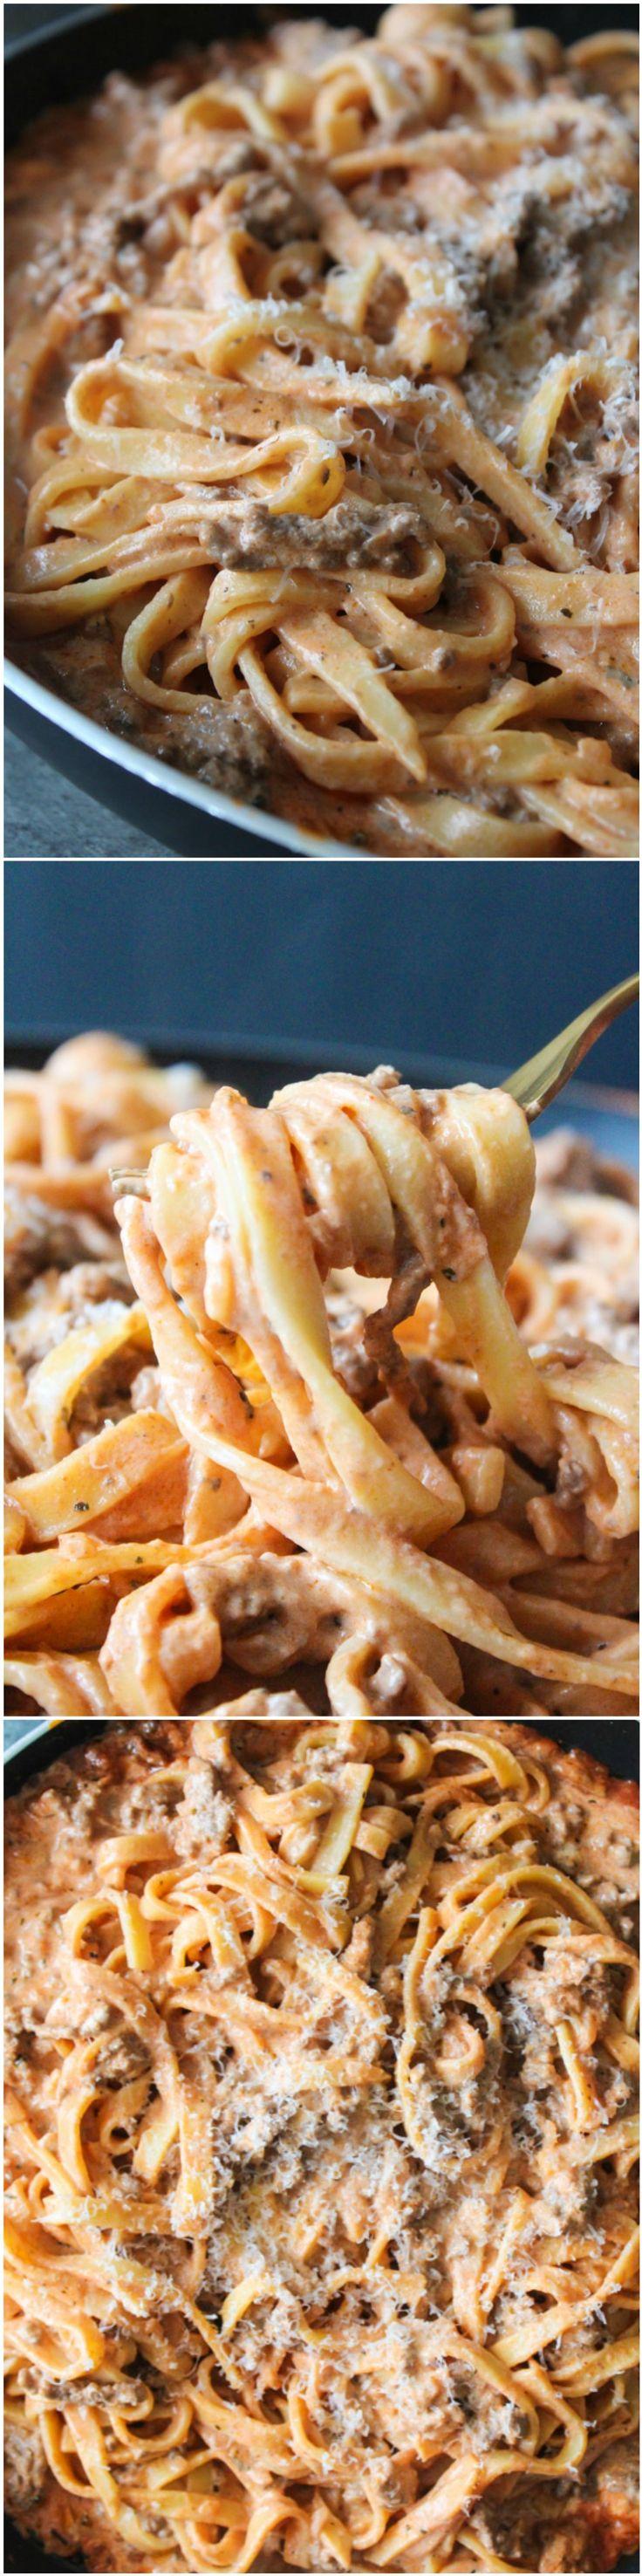 Homemade Creamy Meat Sauce And Spaghetti - Easy Dinner